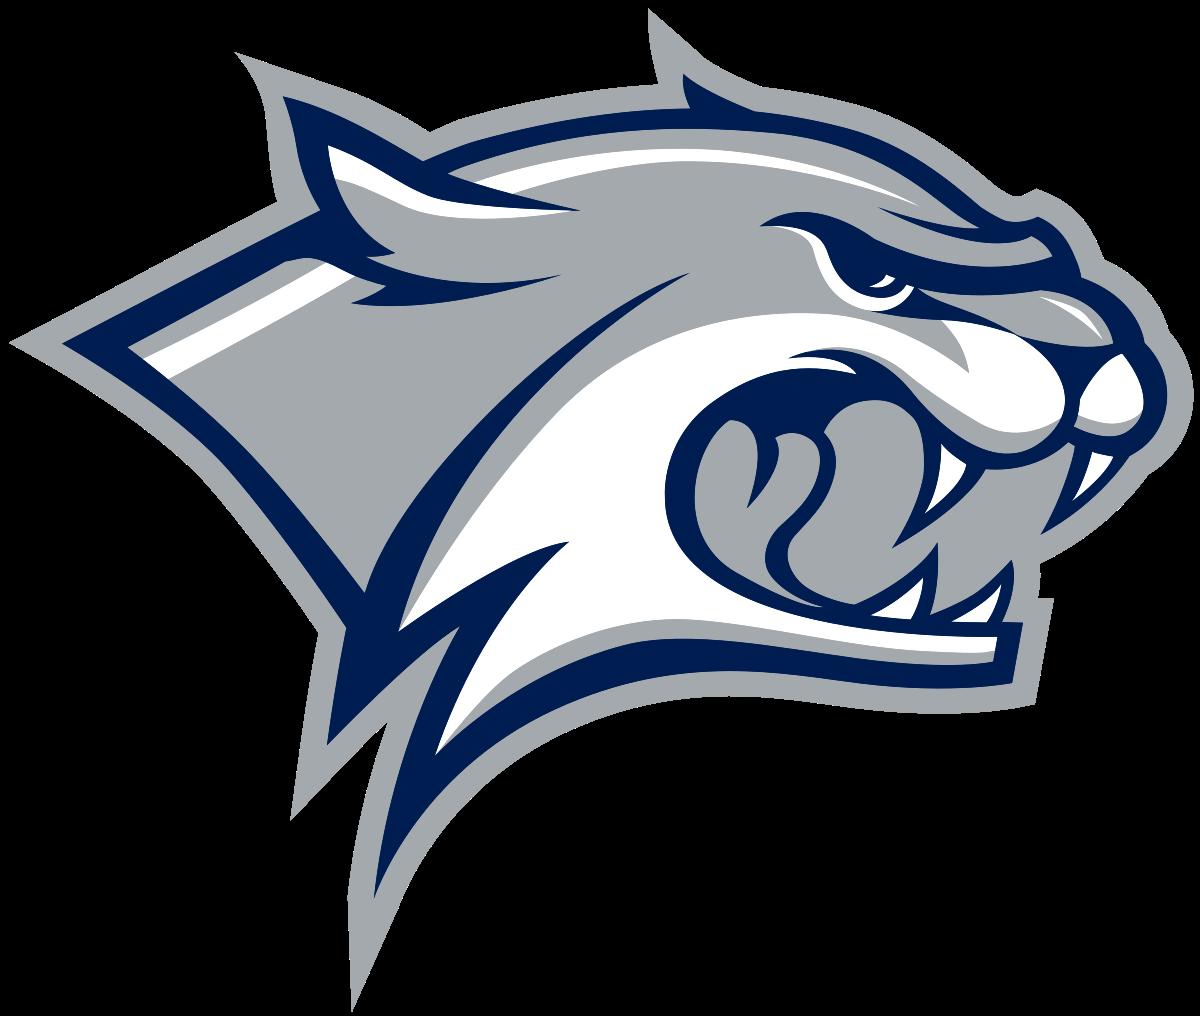 Wildcat school mascot clipart clip library download New Hampshire Wildcats - Wikipedia clip library download